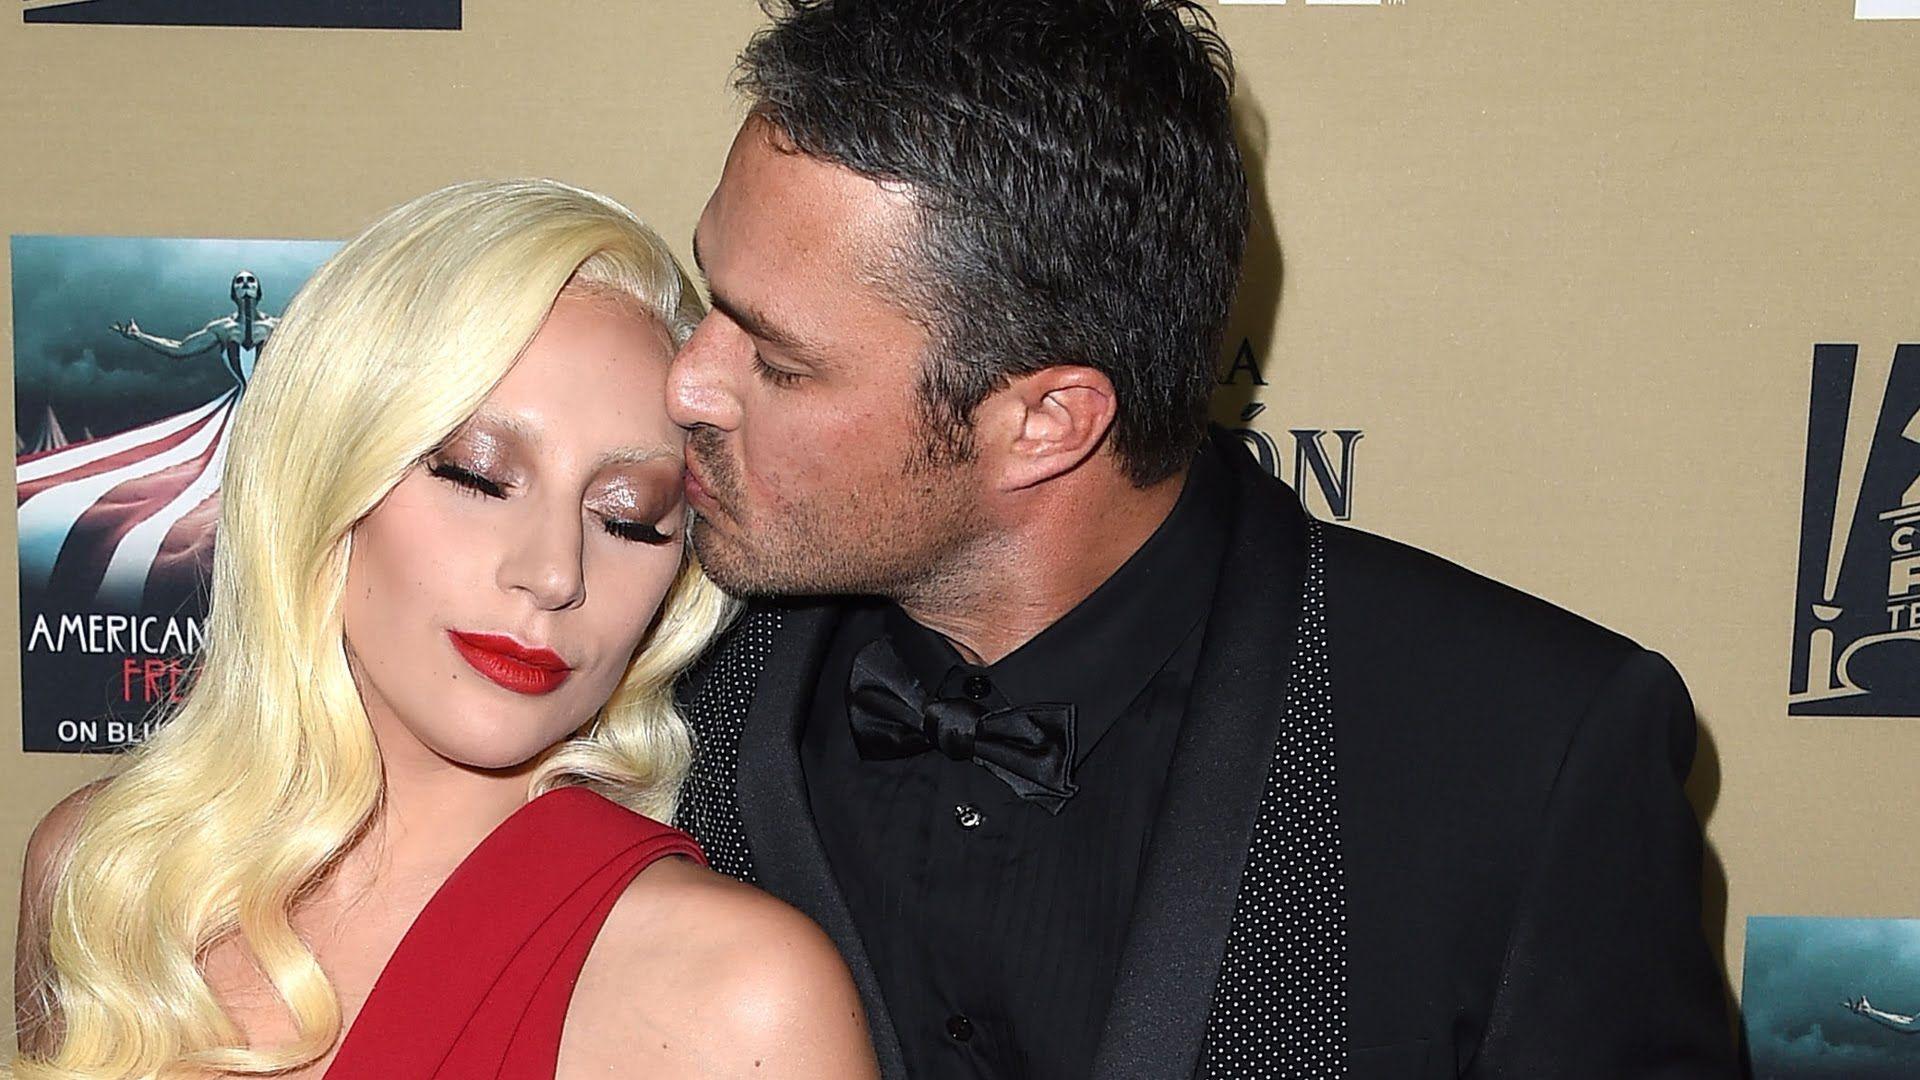 Golden Globes 2014: Lady Gaga Makes Rare PDA With